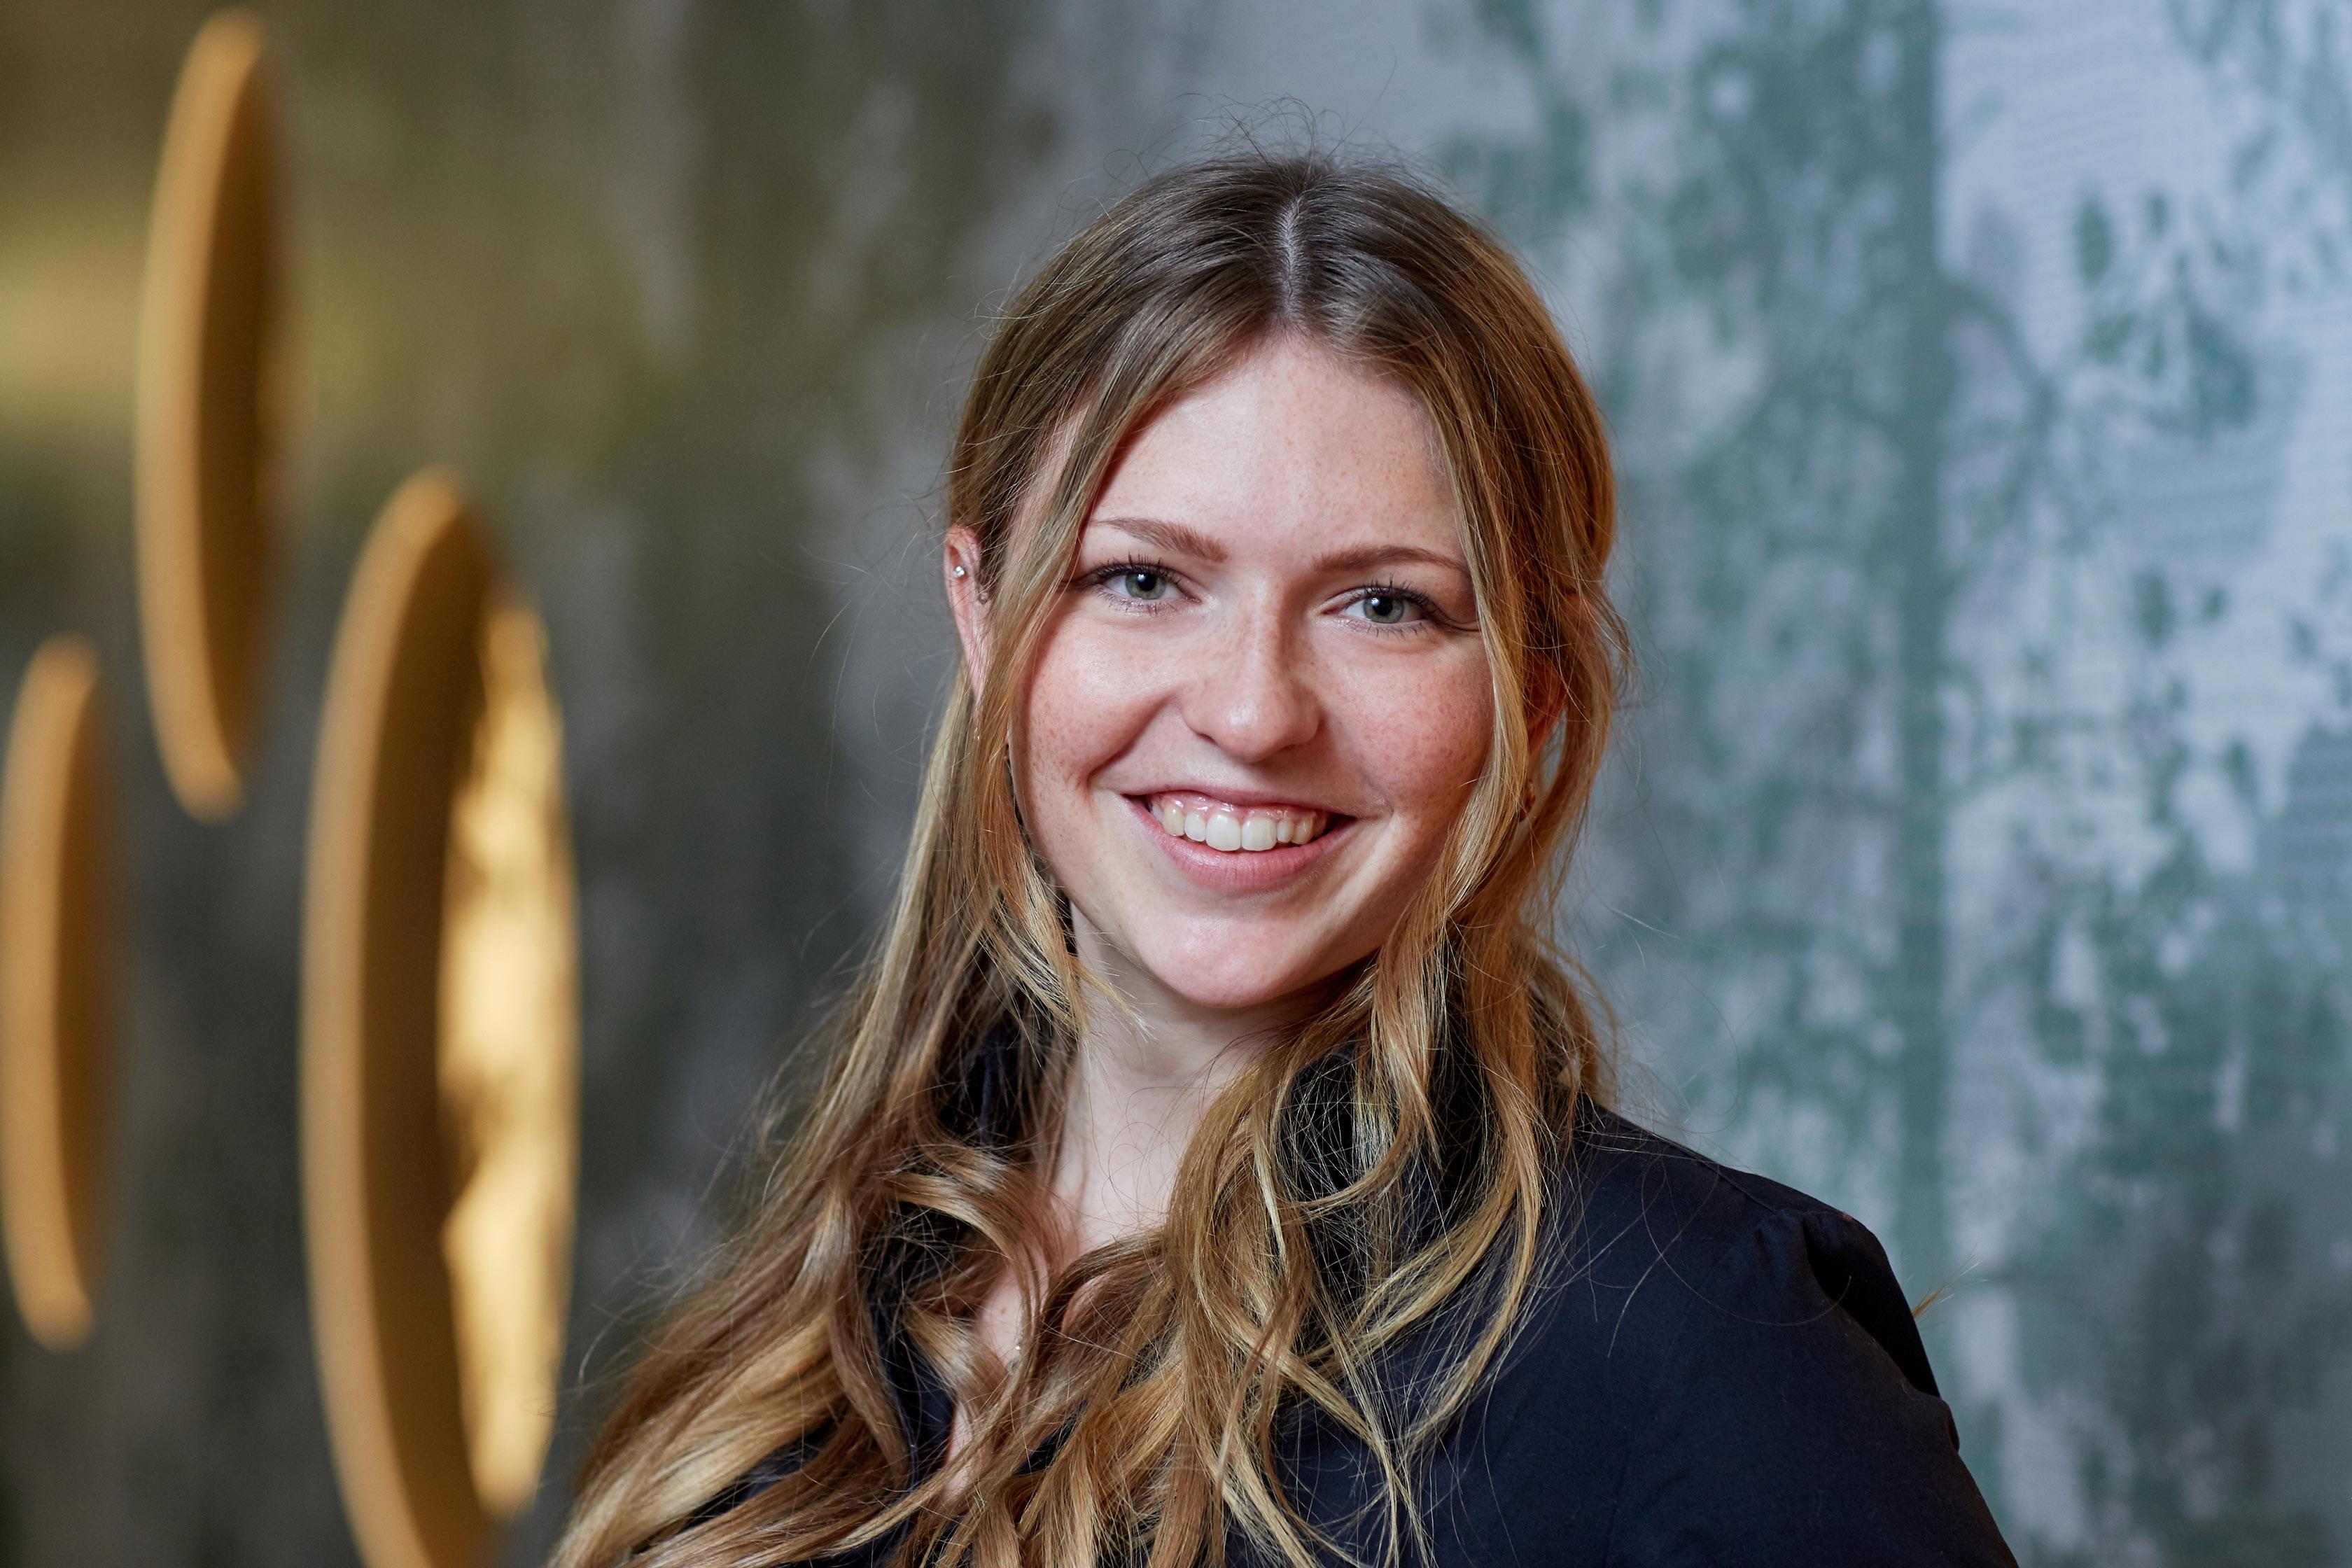 Julia Leifels